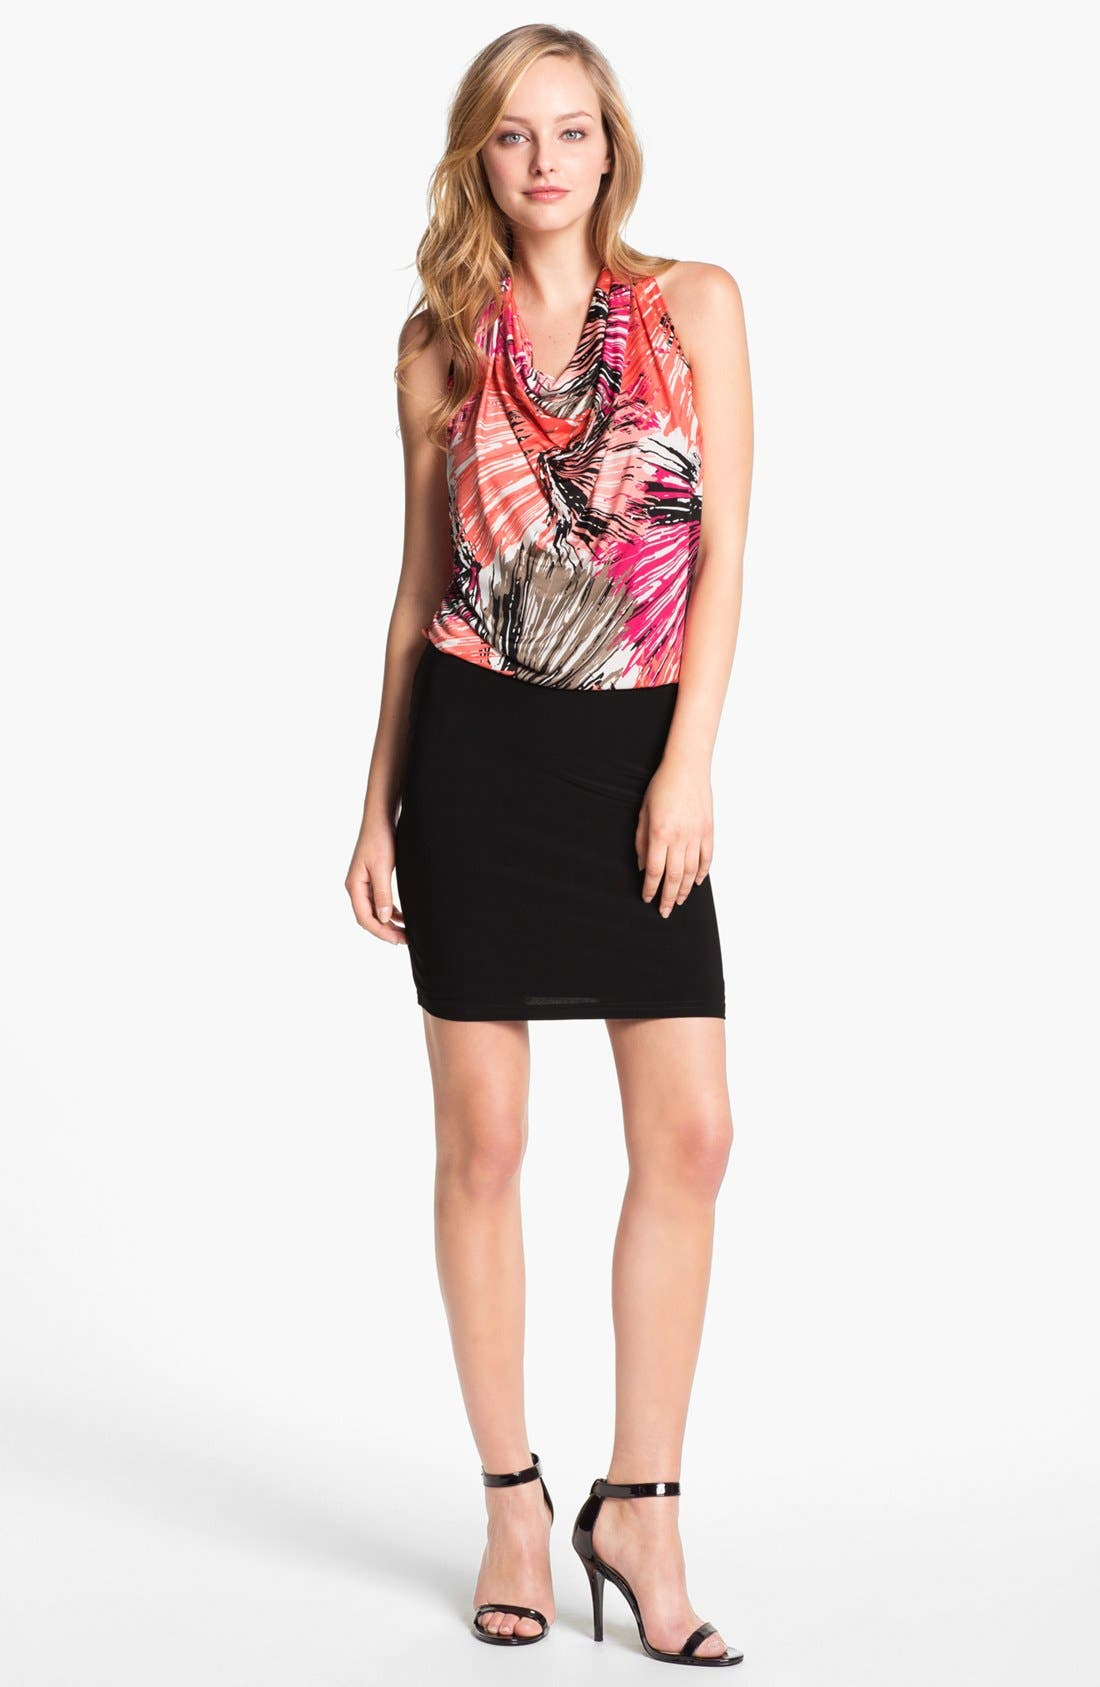 Main Image - Abi Ferrin 'Fantasia' Sleeveless Blouson Dress